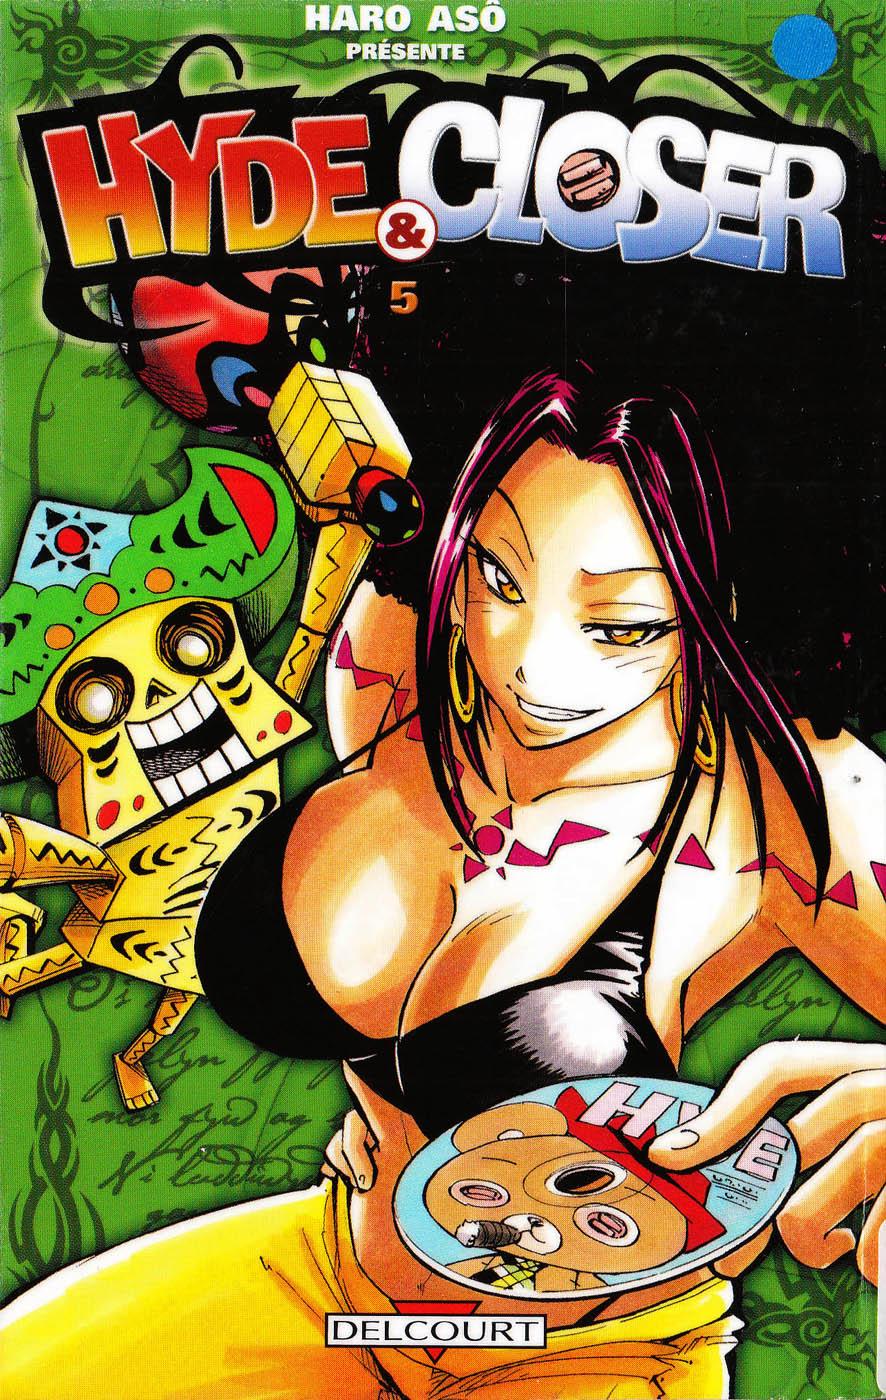 https://nine.mangadogs.com/fr_manga/pic1/25/1049/46812/HydeampCloserHydeCloserVol_0_149.jpg Page 1